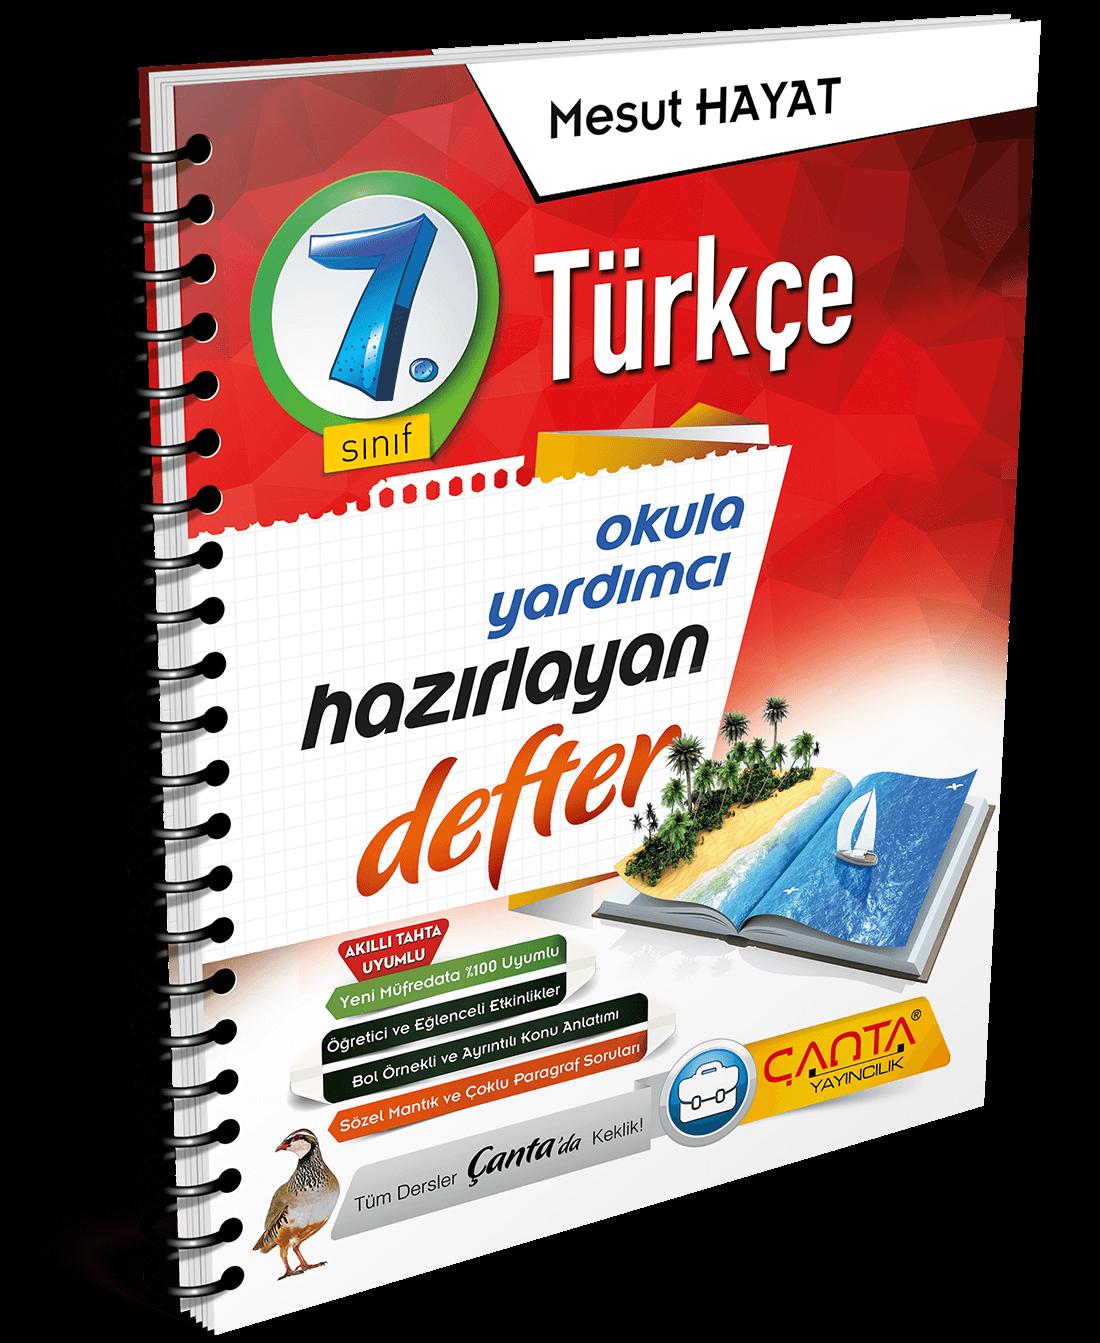 7. Sınıf – Türkçe Hazırlayan Defter